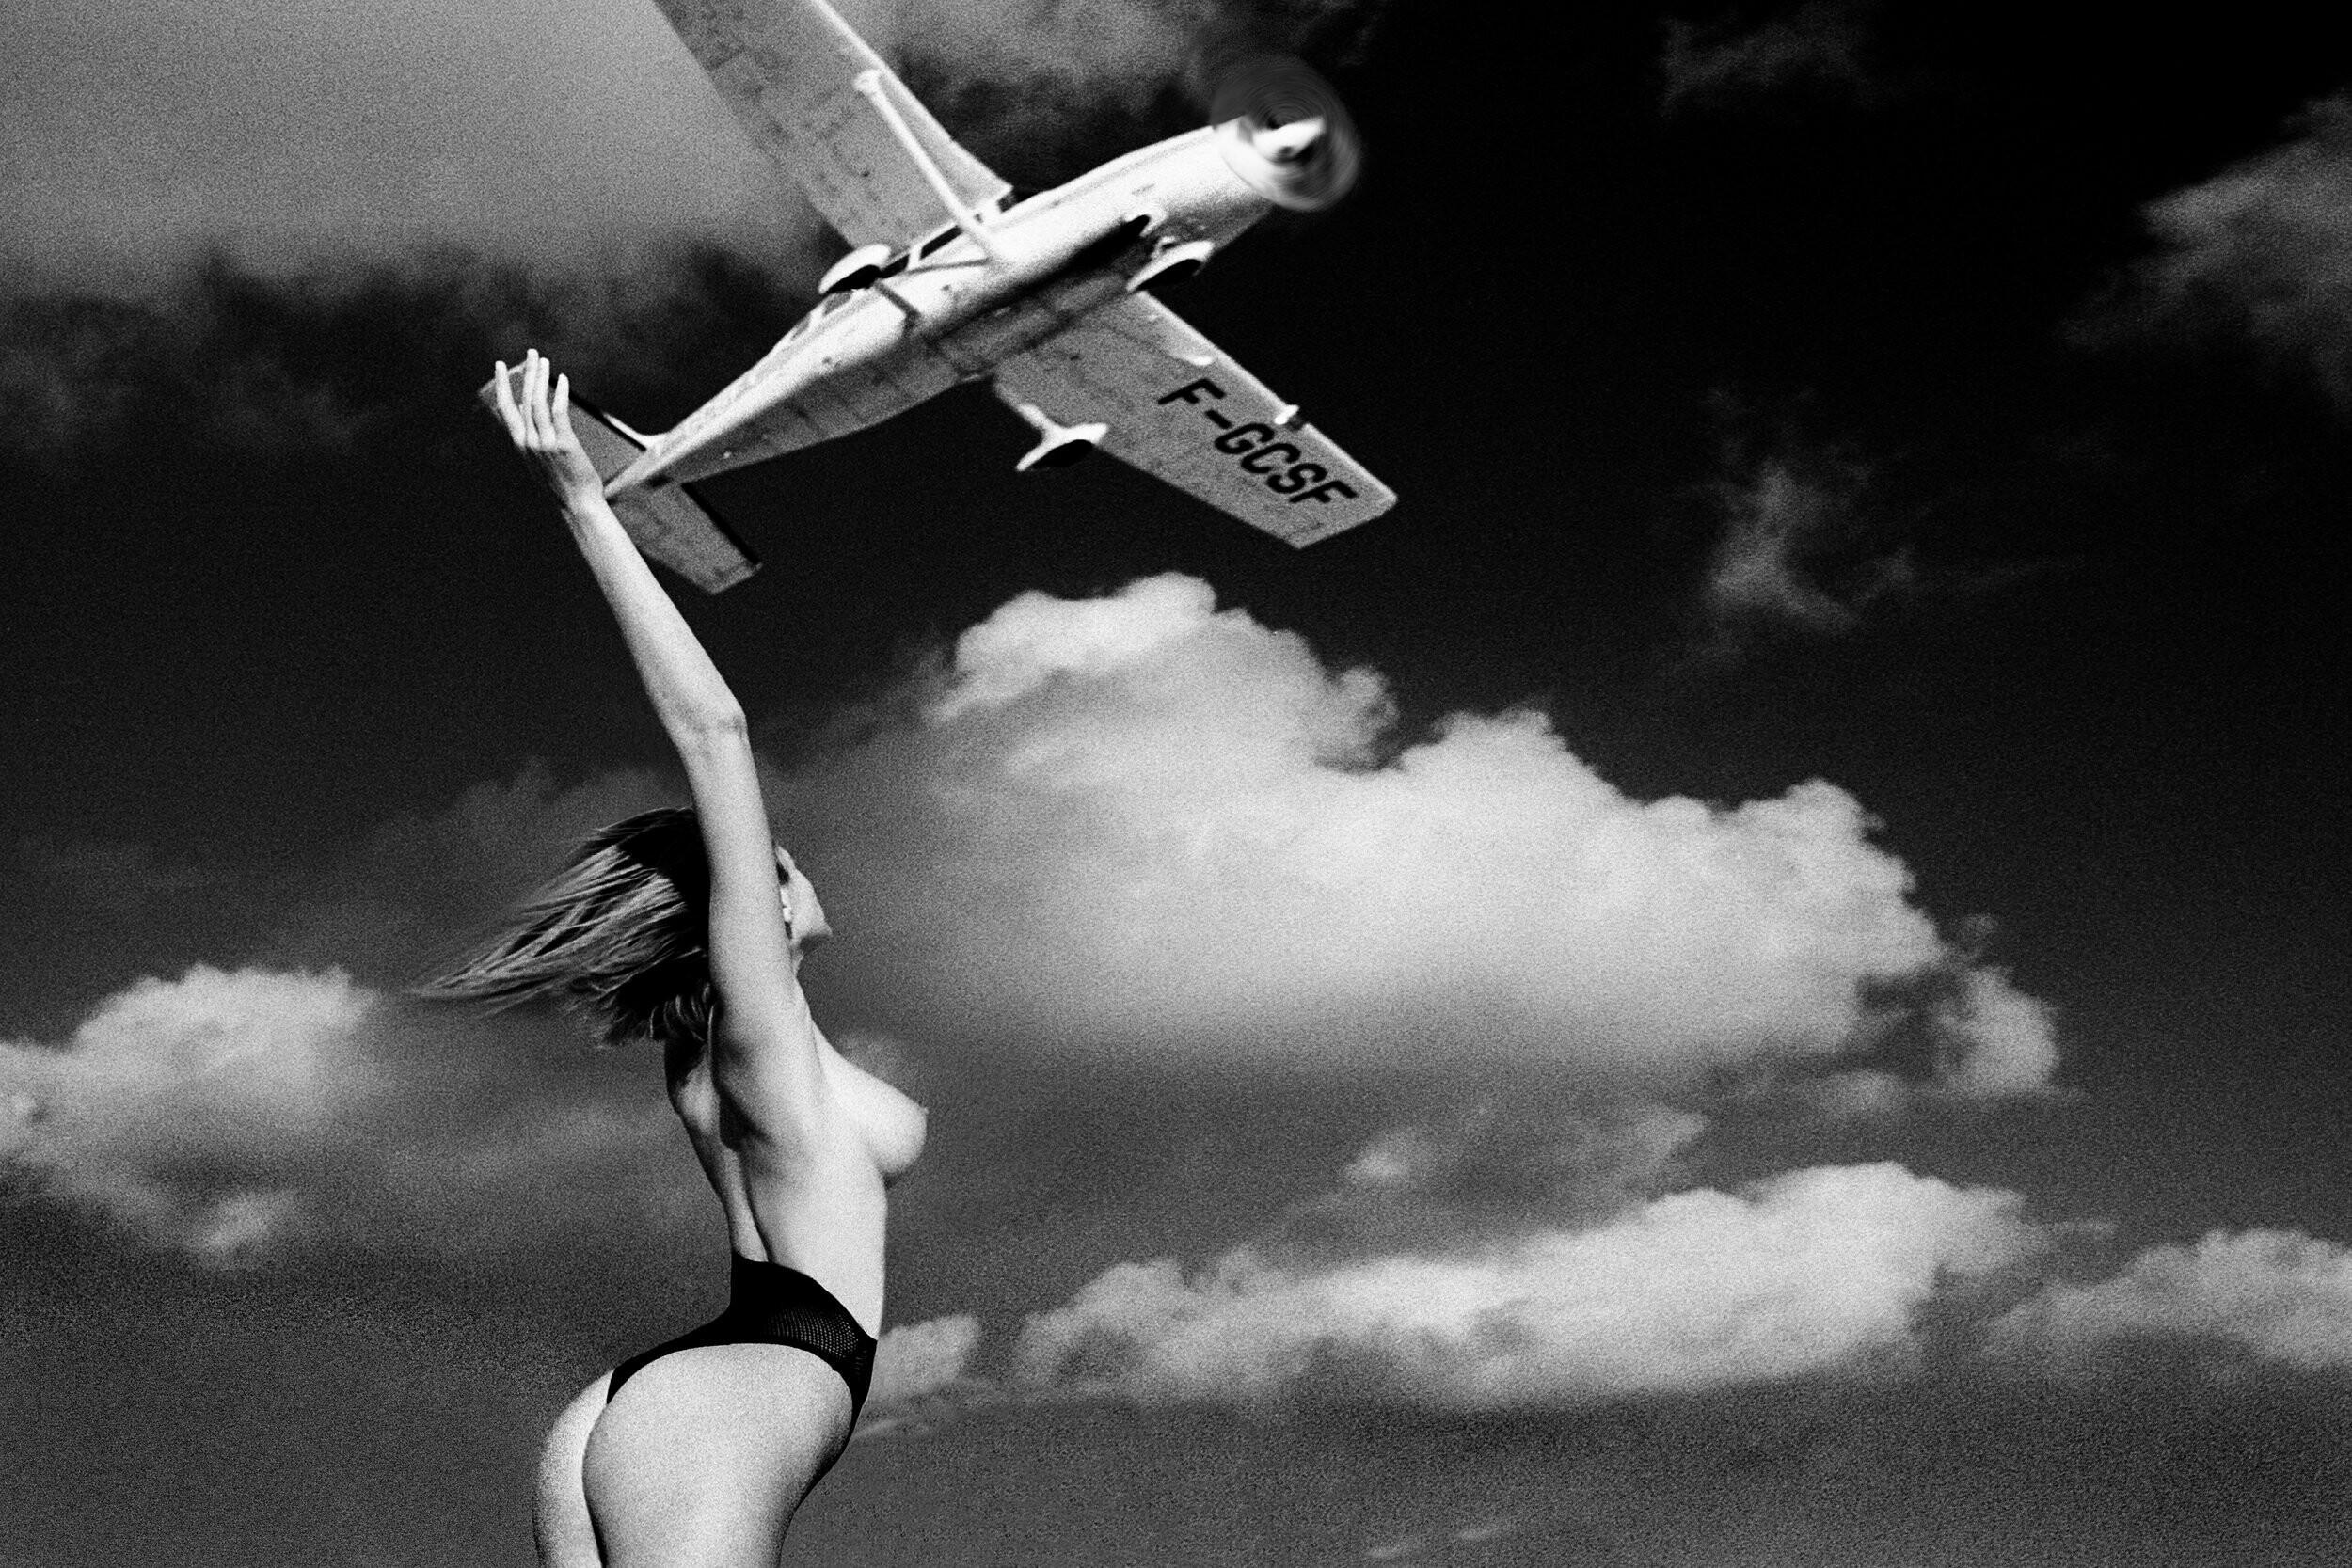 Эшли и самолёт, 1984. Фотограф Марко Главиано